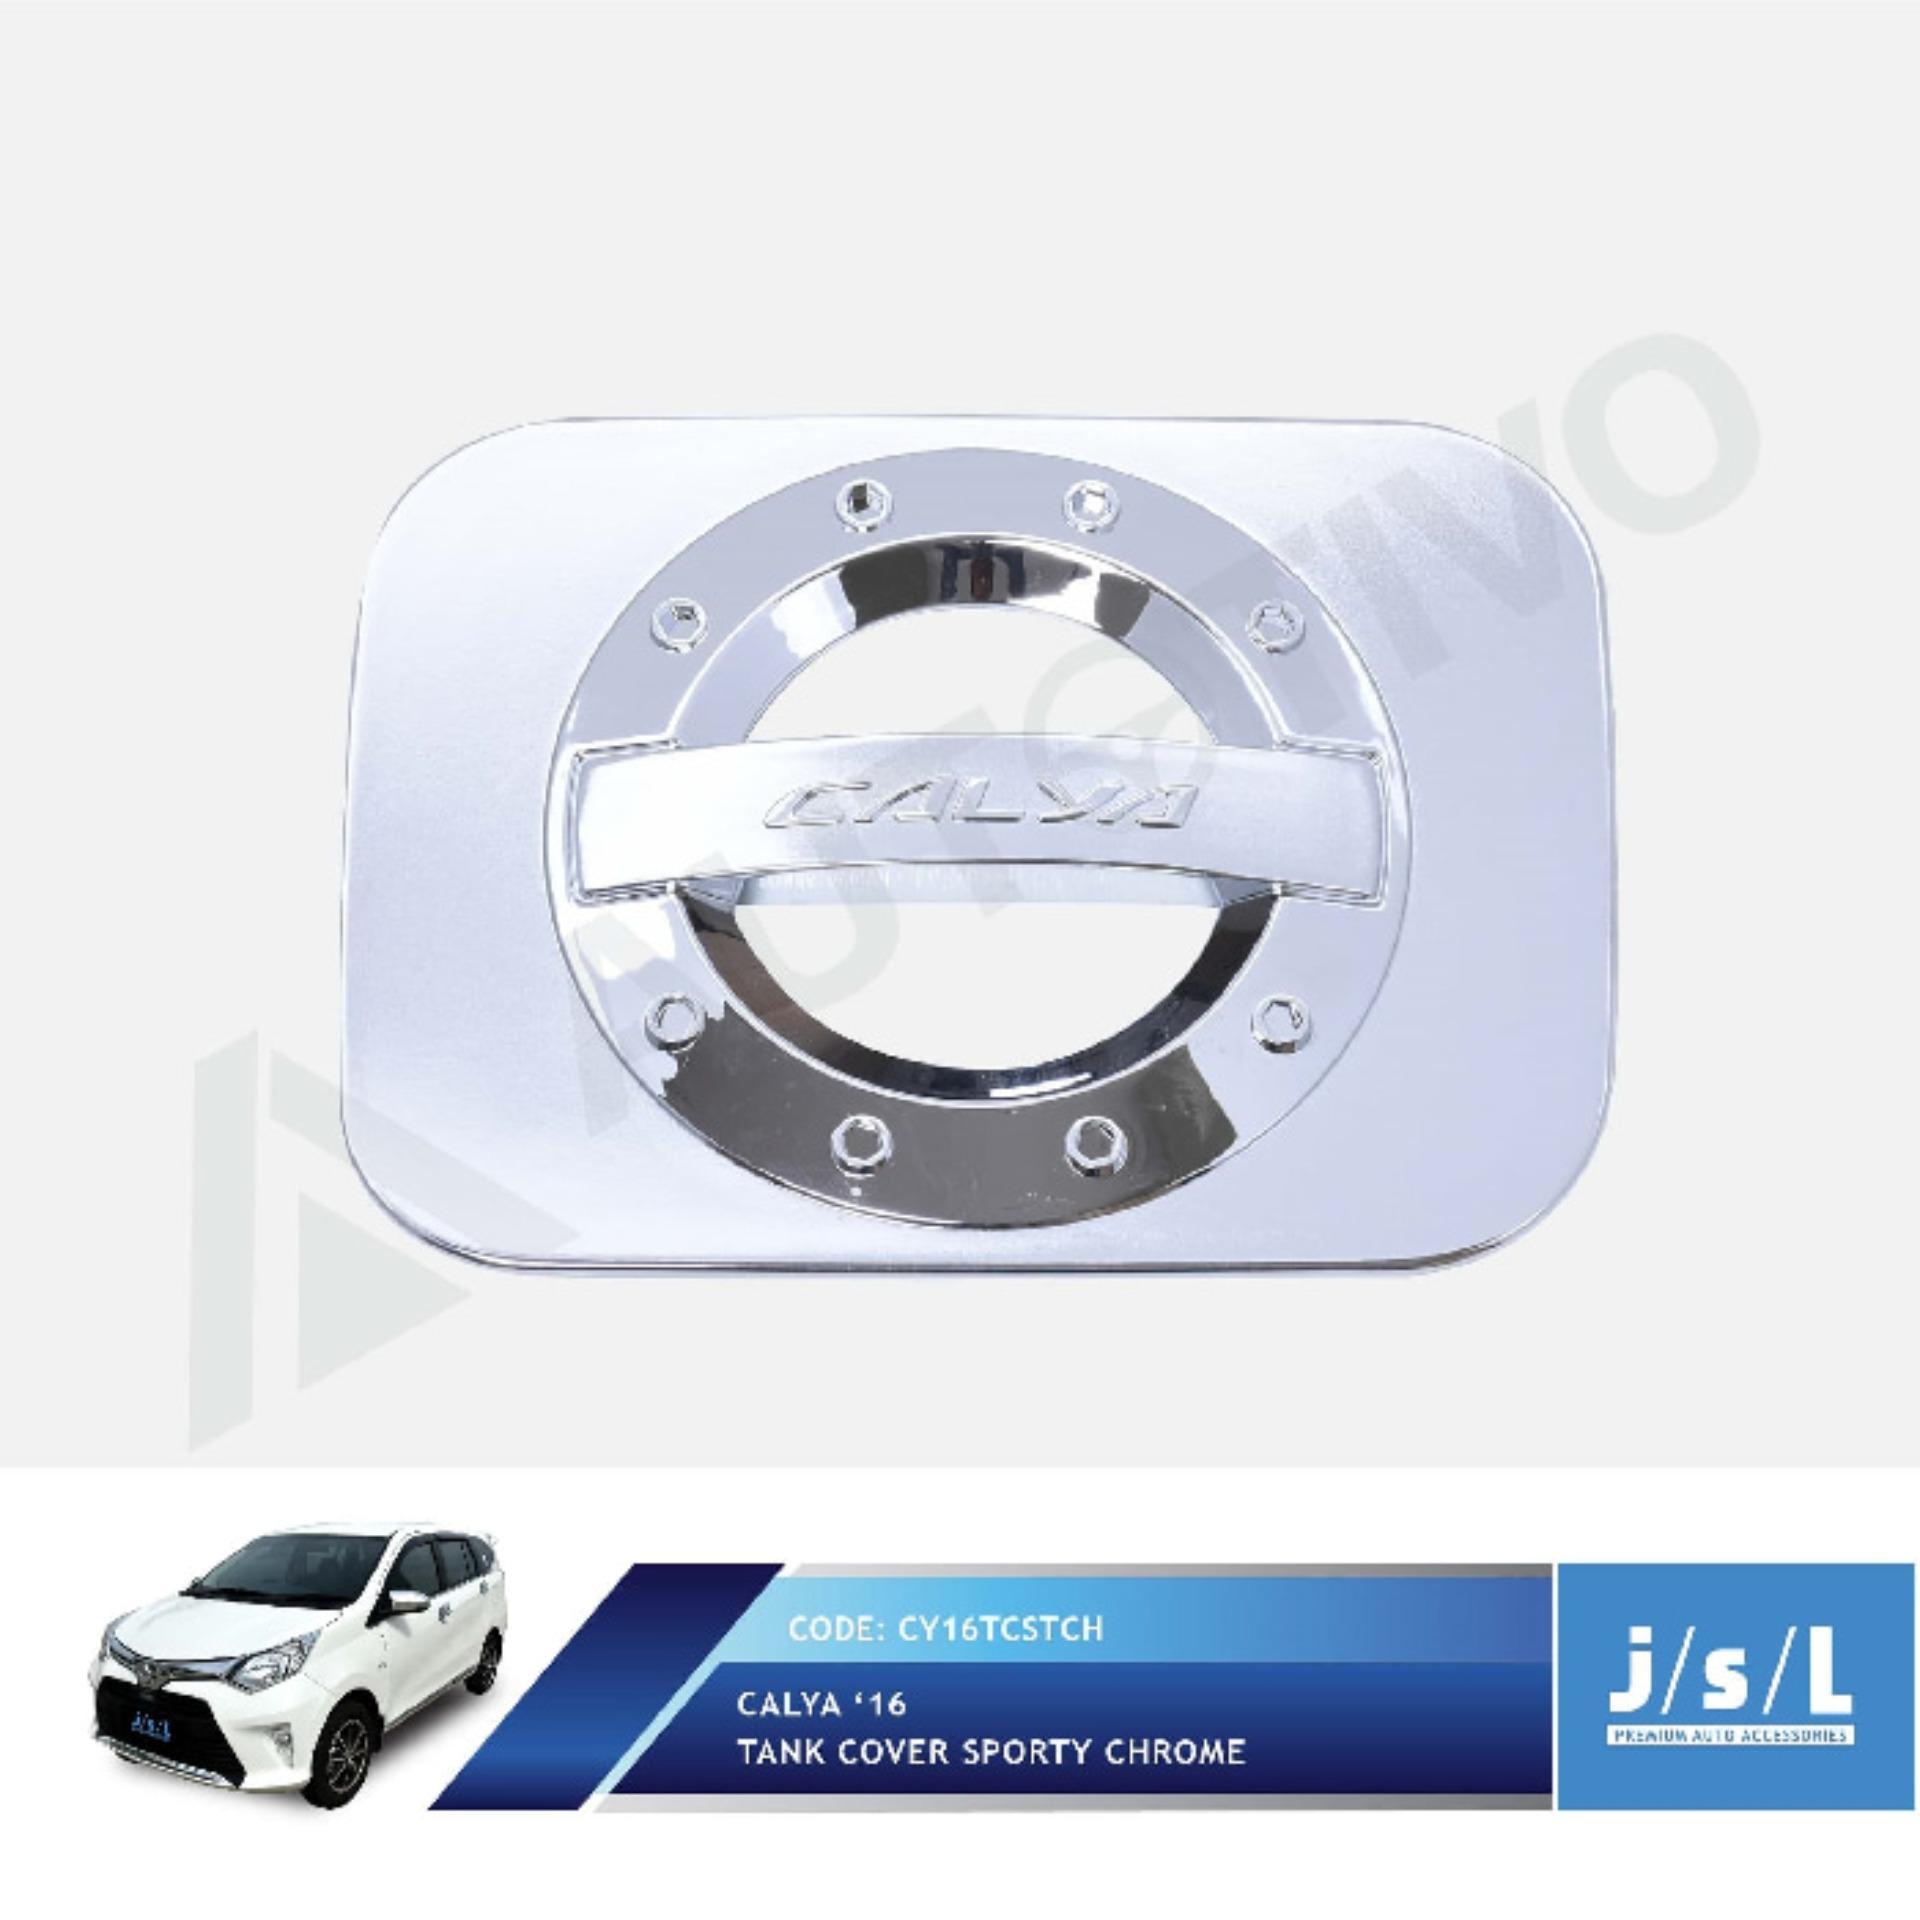 Harga Jsl Tank Cover Luxury White Ertiga Otomotif Terbaru Source toyota calya cover .